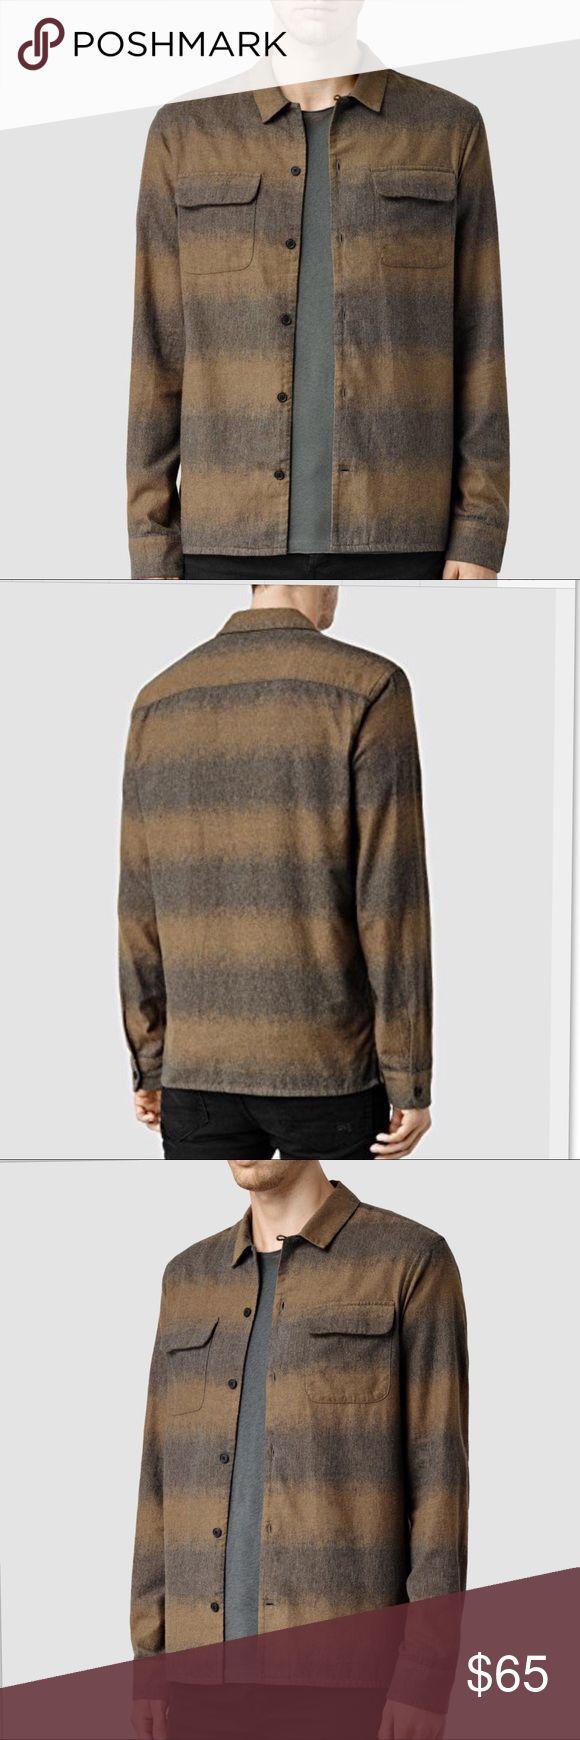 All Saints Appalachia LS Shirt Mustard /Gray Marl Men's Appalachia Shirt L Mustard/Grey Marl. Casual Button-Down Shirts. 100% Cotton-Machine Wash - Hang Dry All Saints Shirts Casual Button Down Shirts